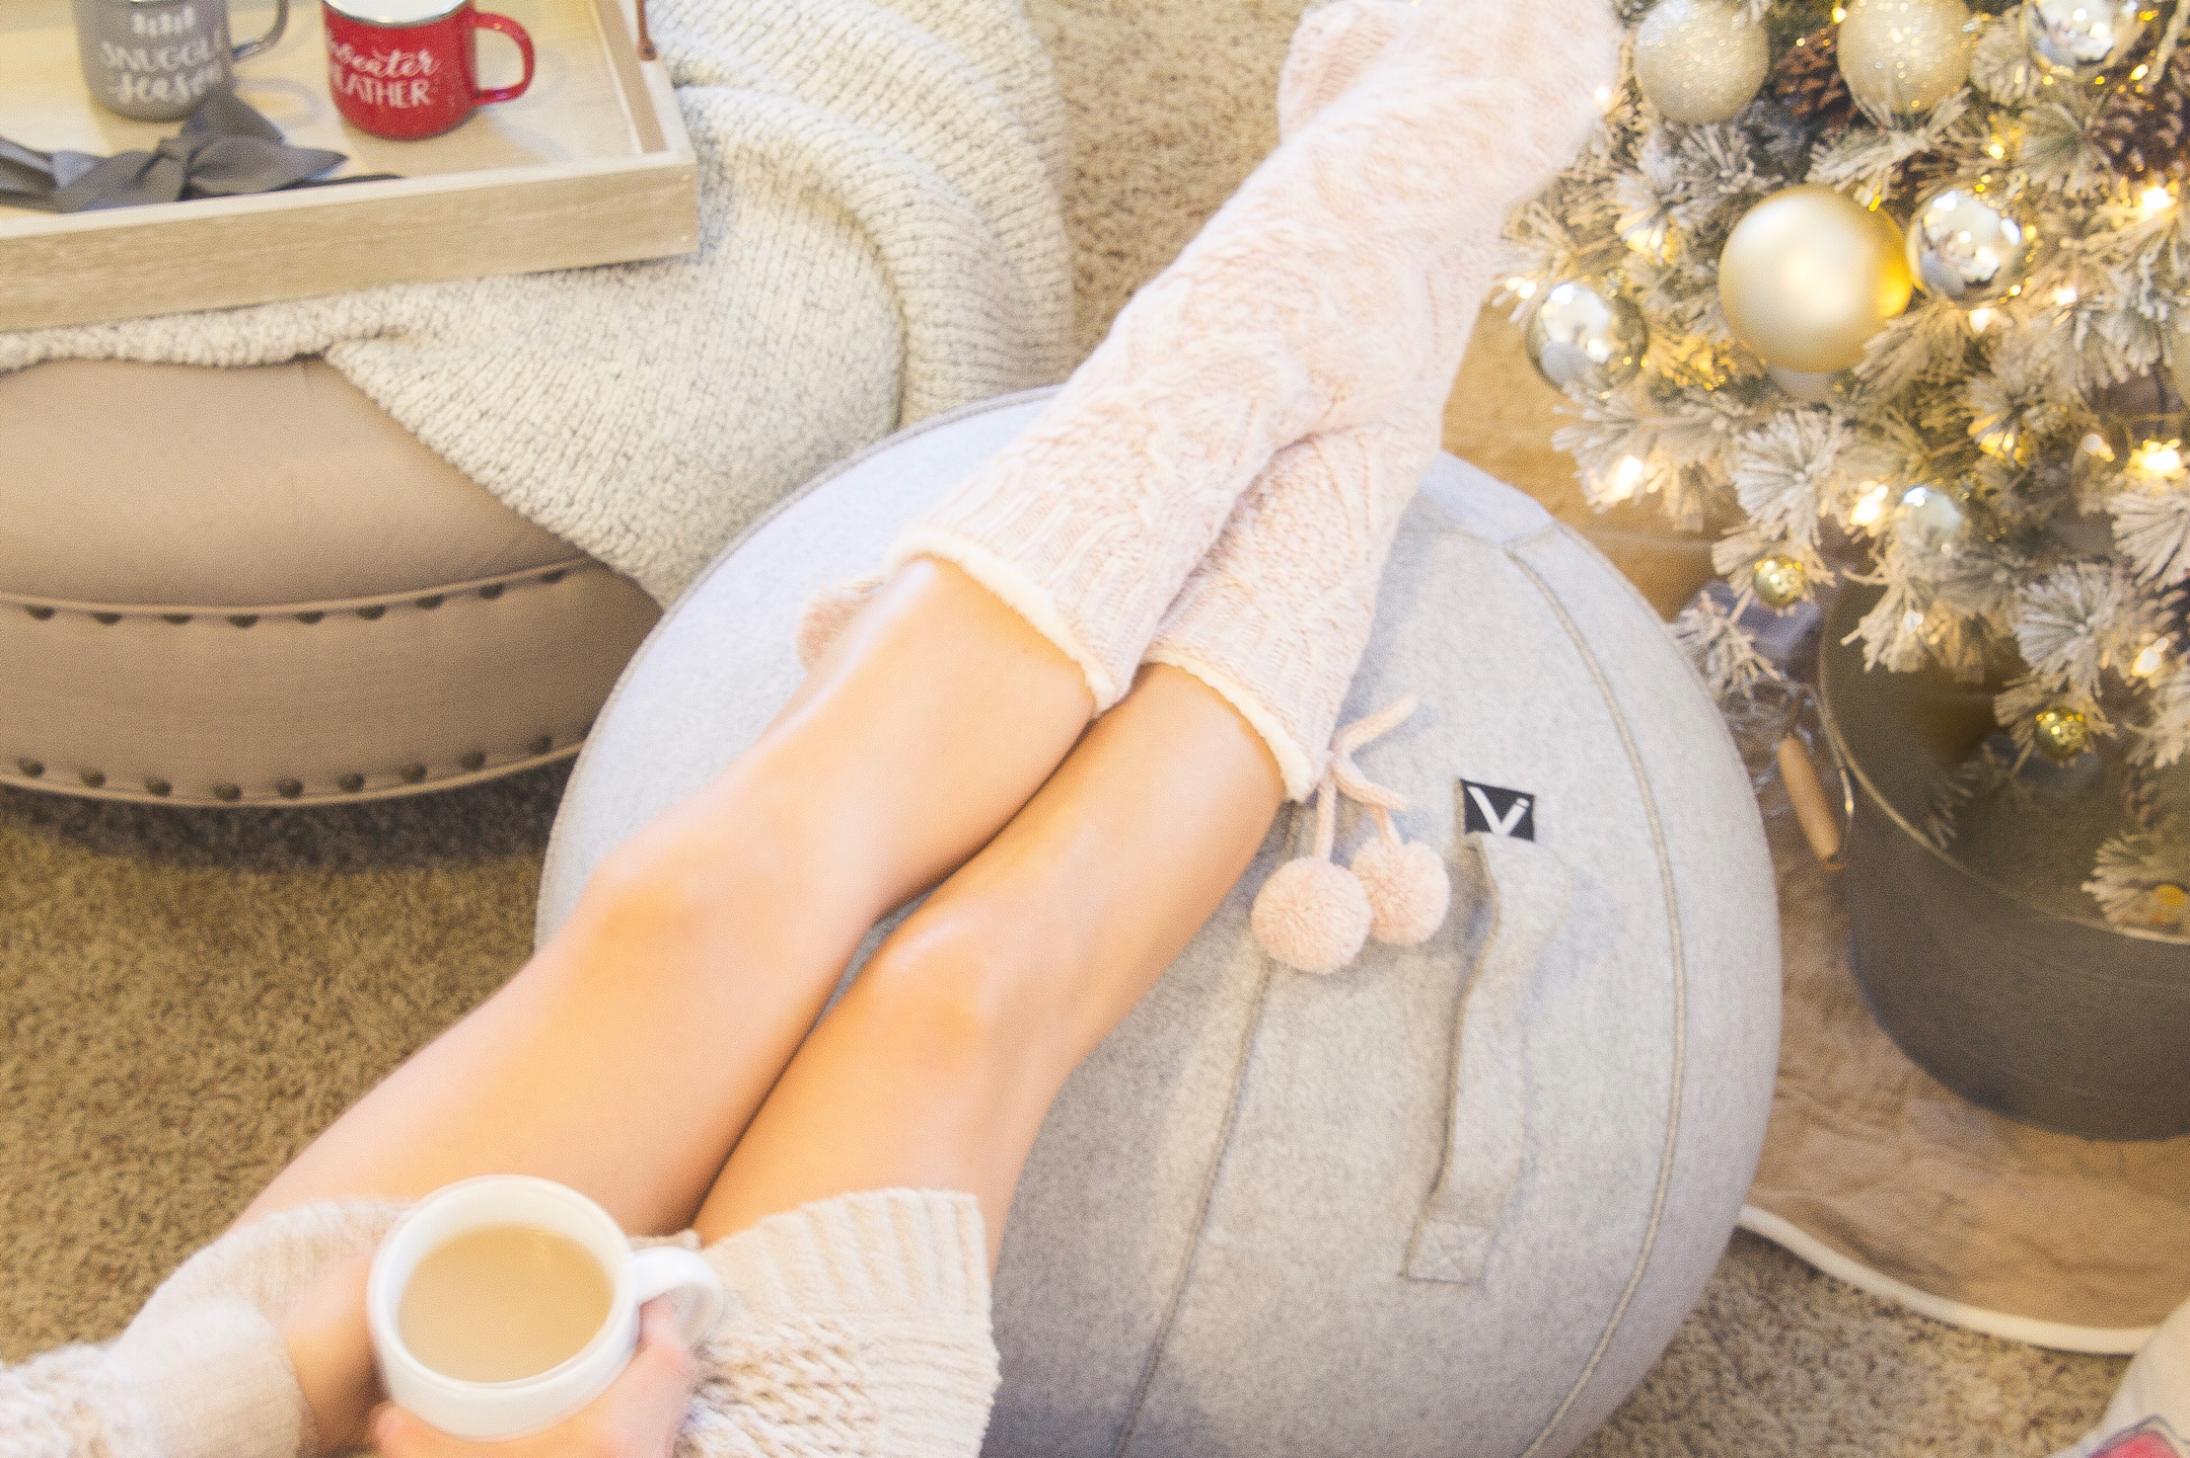 woman legs luno sitting ball